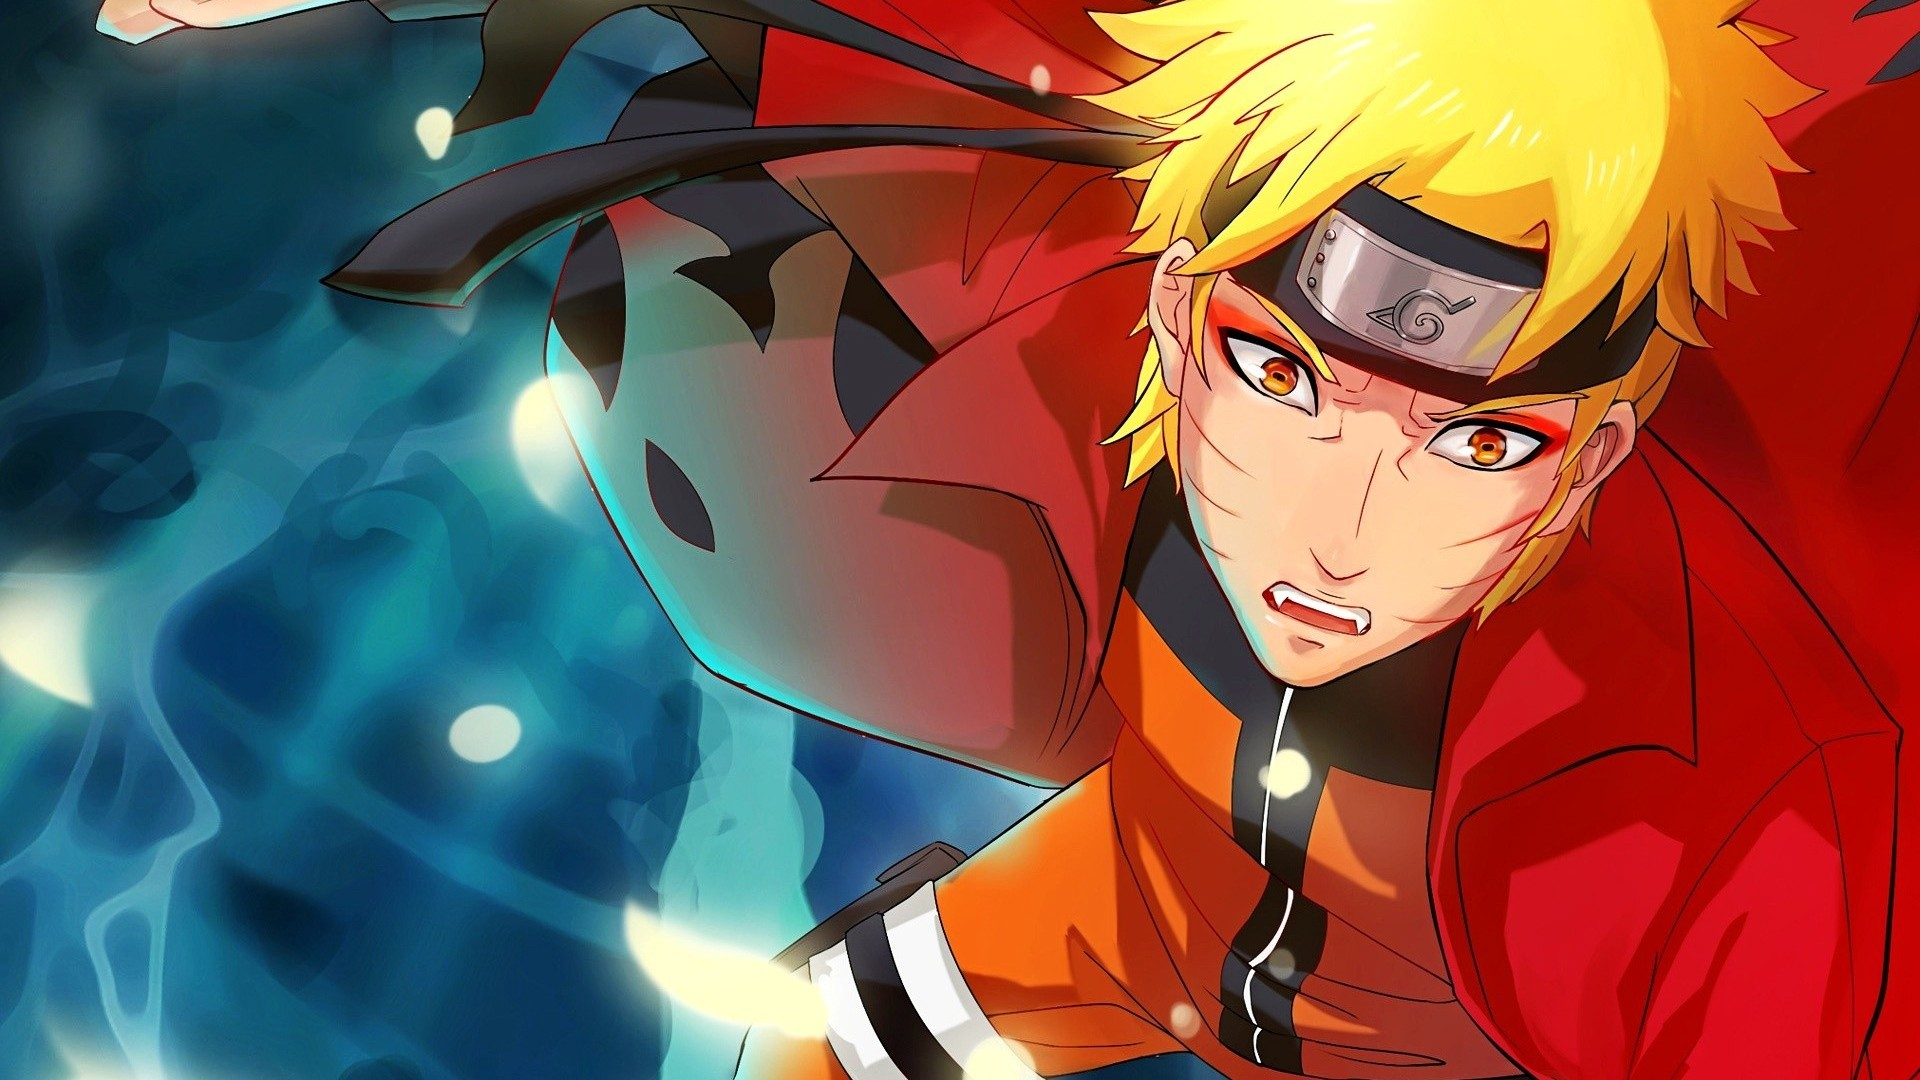 Uzumaki Naruto Wallpapers 73 Images